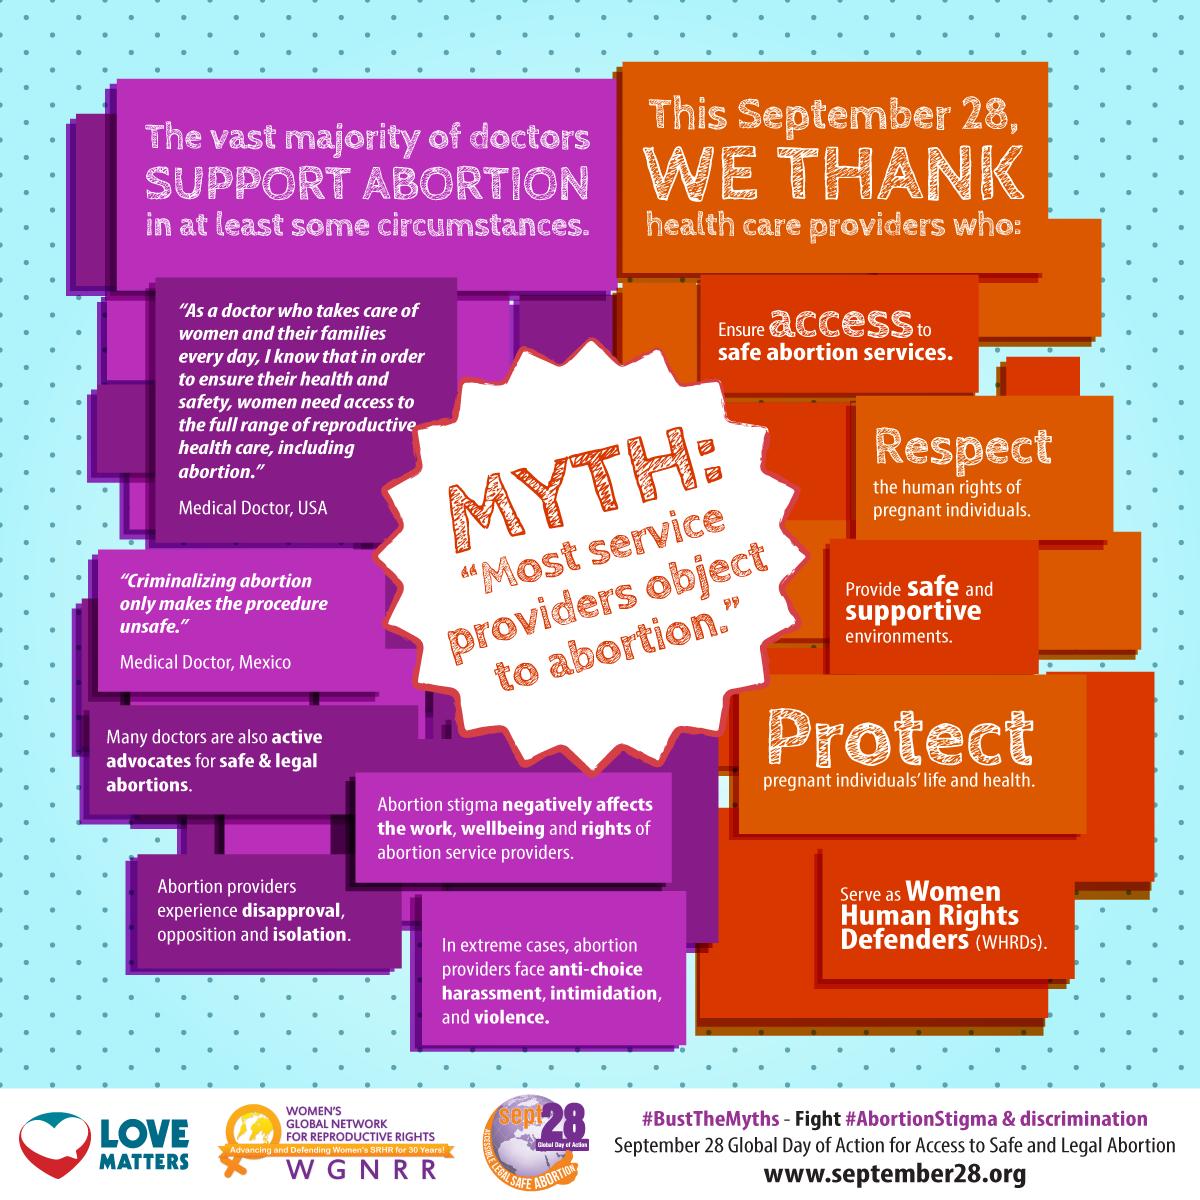 LM-abortionStigmaSP-info4-150915